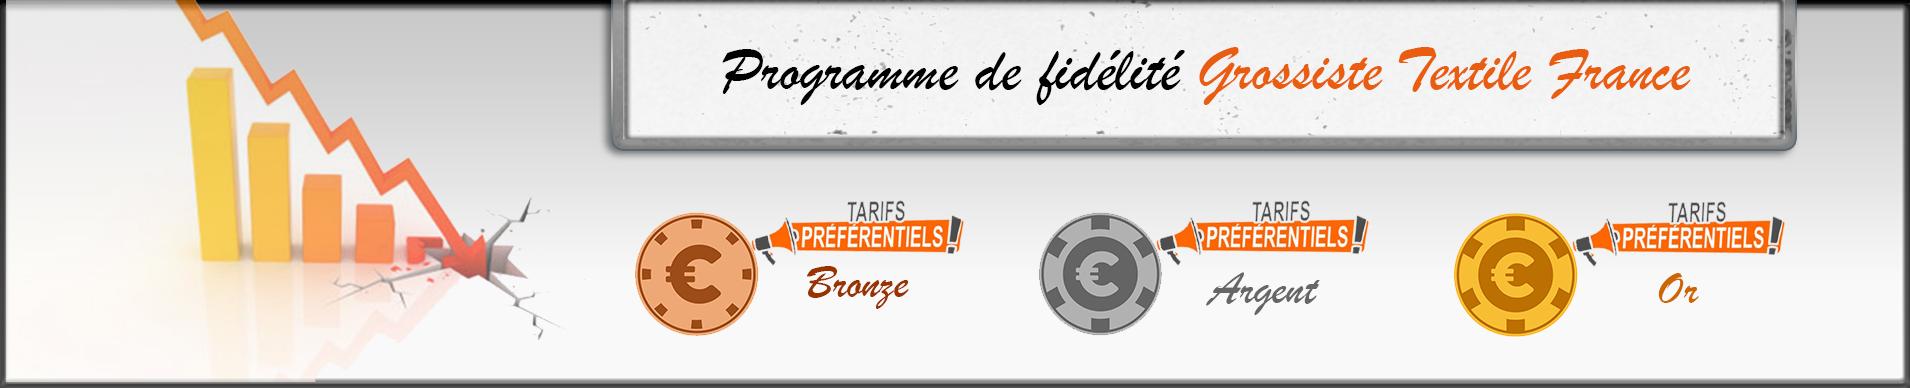 programme fidelite